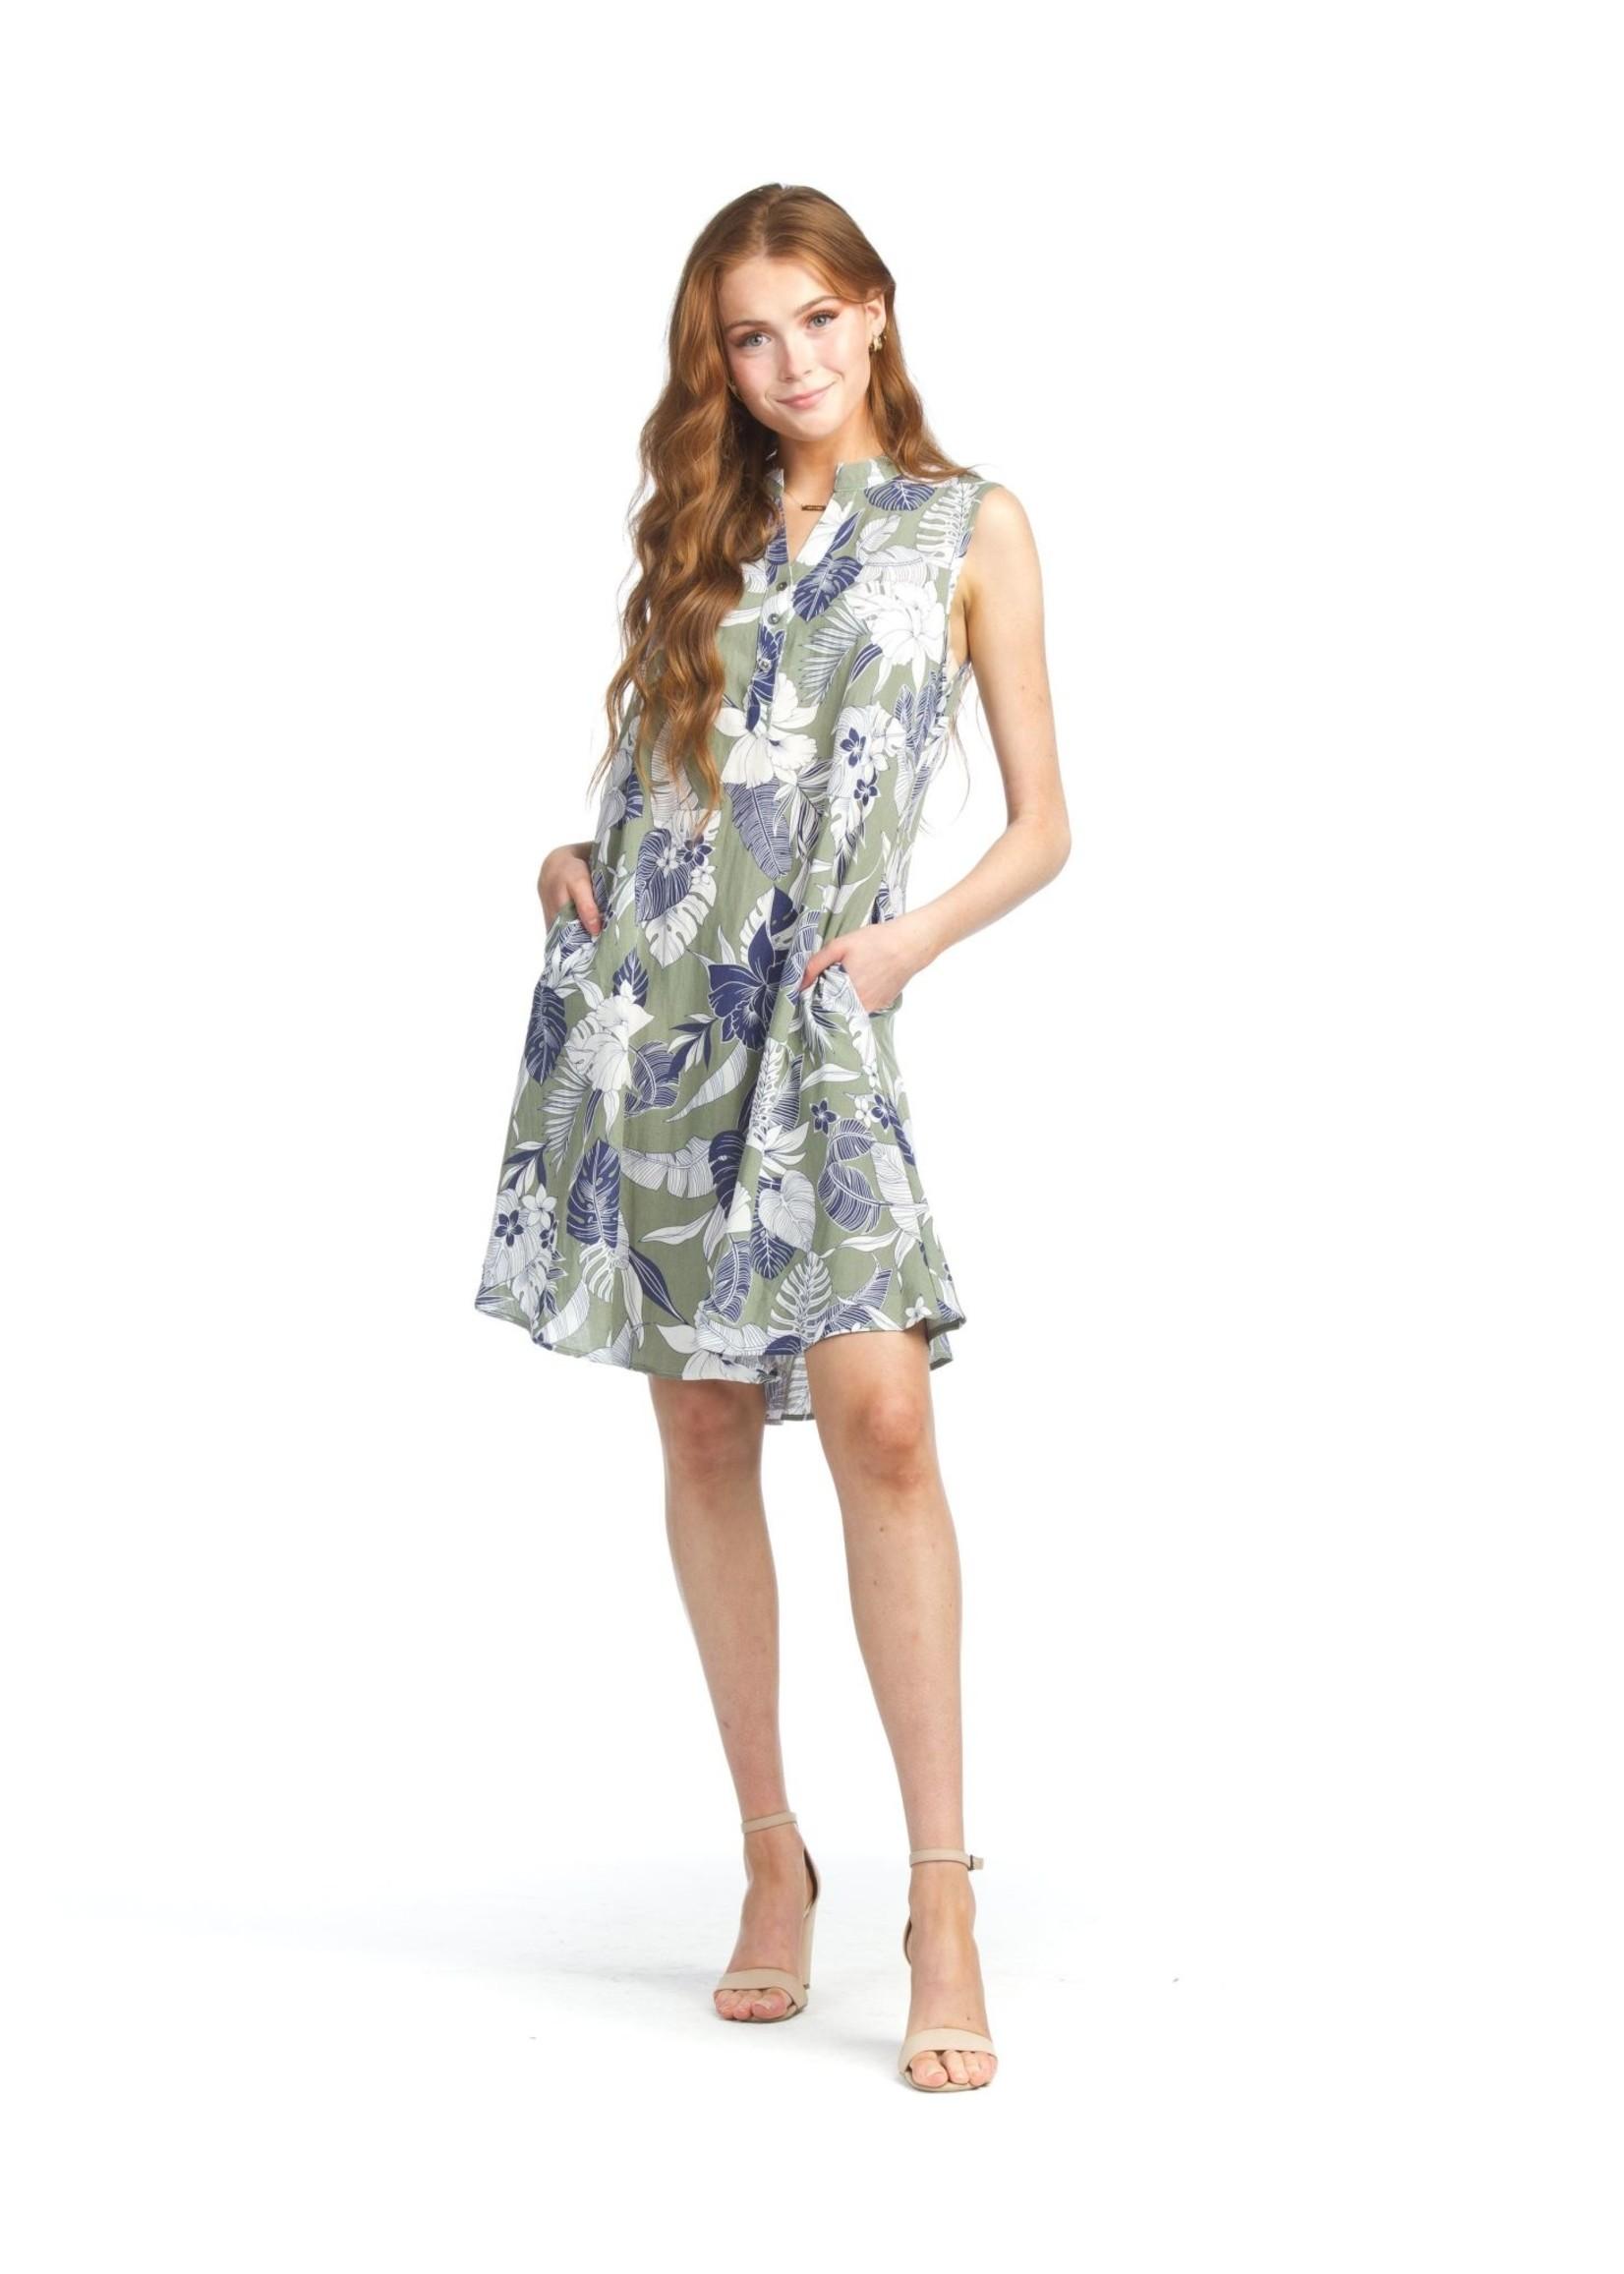 Papillon Floral & Leaf Print Henley Dress